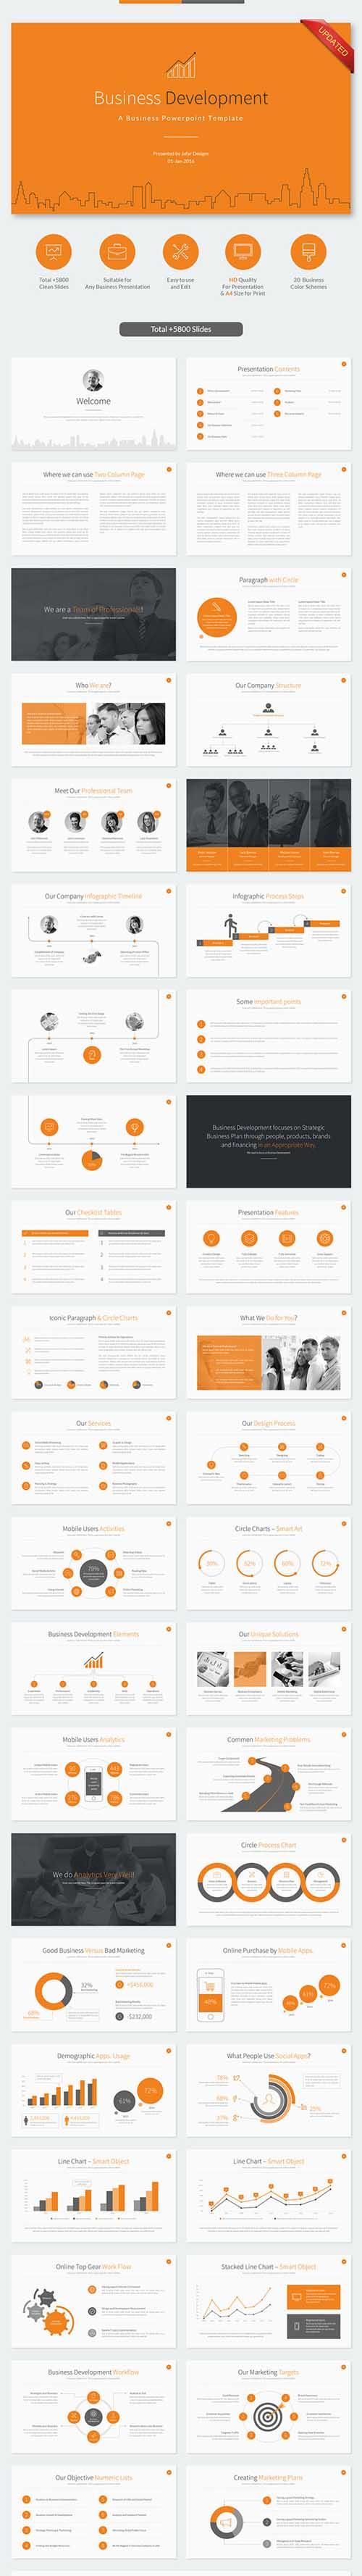 Business development powerpoint template crisp design elements for business development powerpoint template accmission Gallery